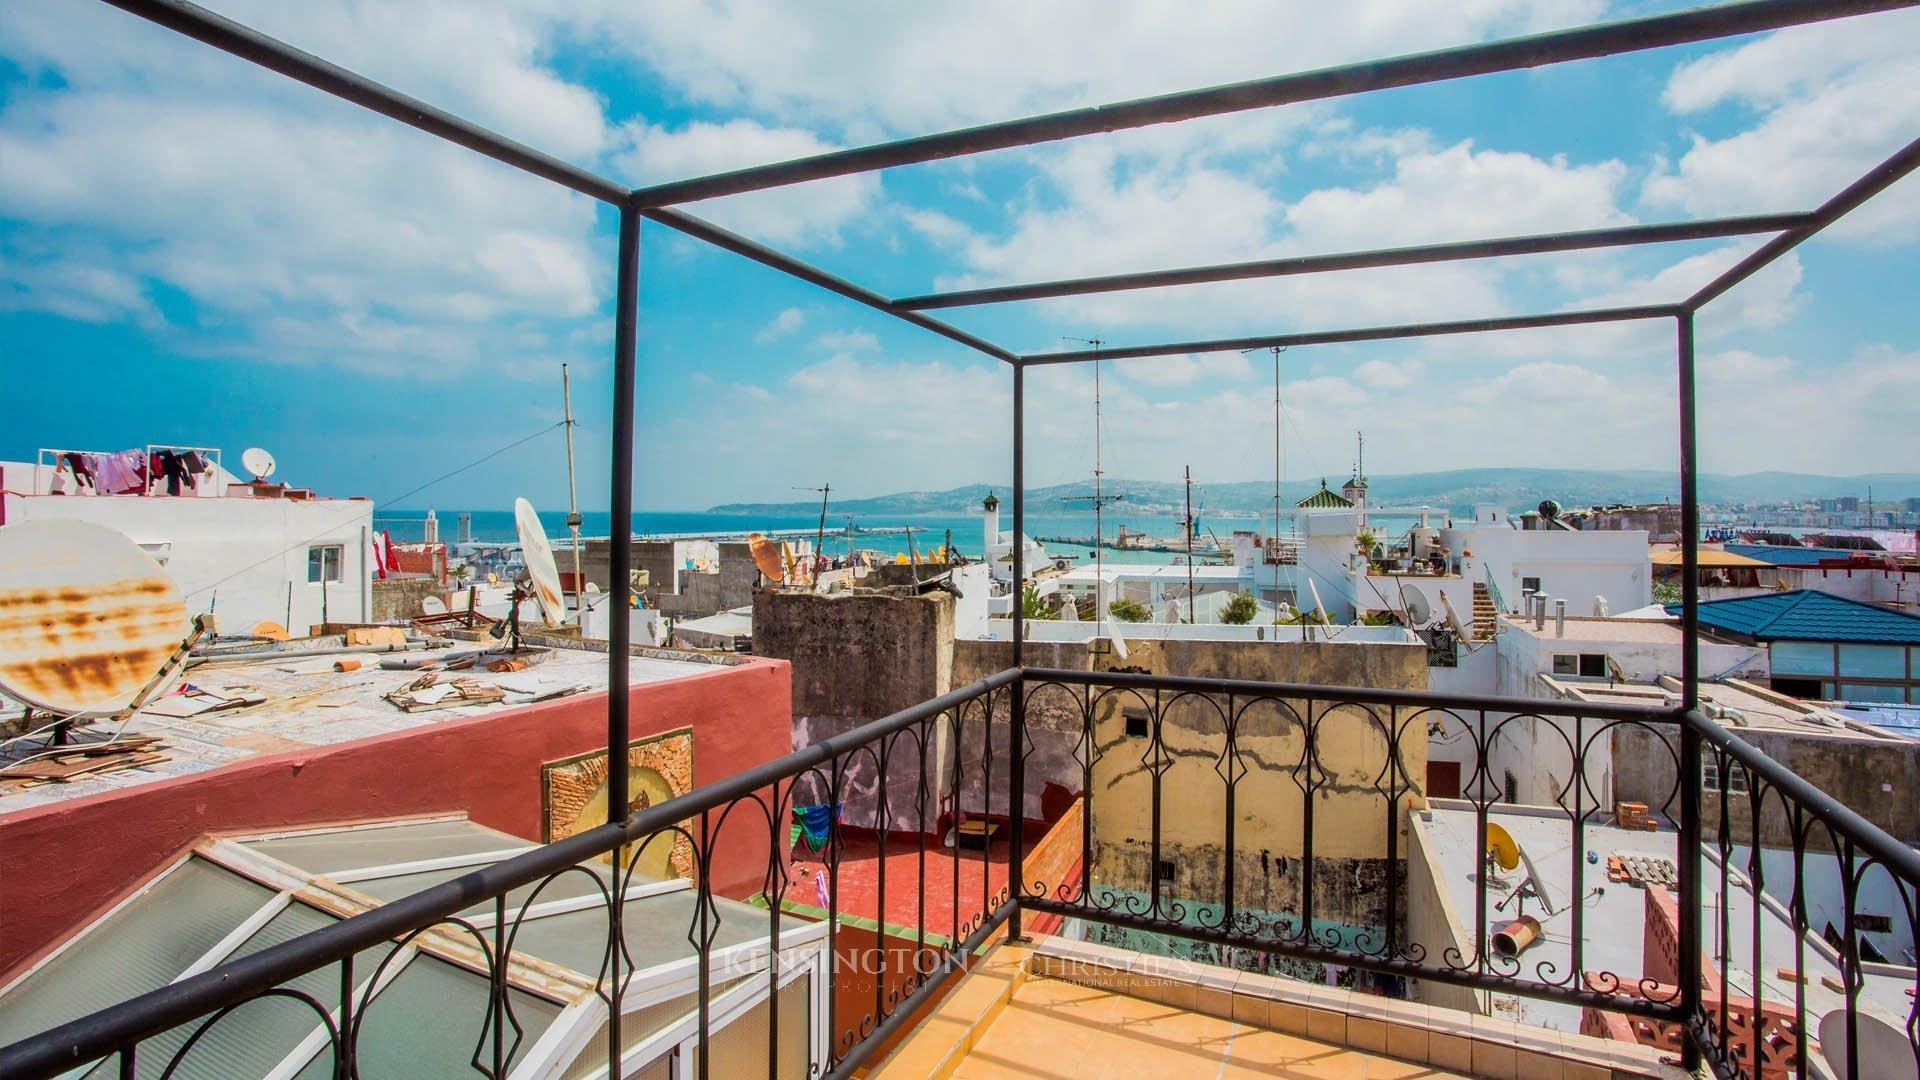 KPPM01214: Villa Cora Luxury Villa Tanger Morocco